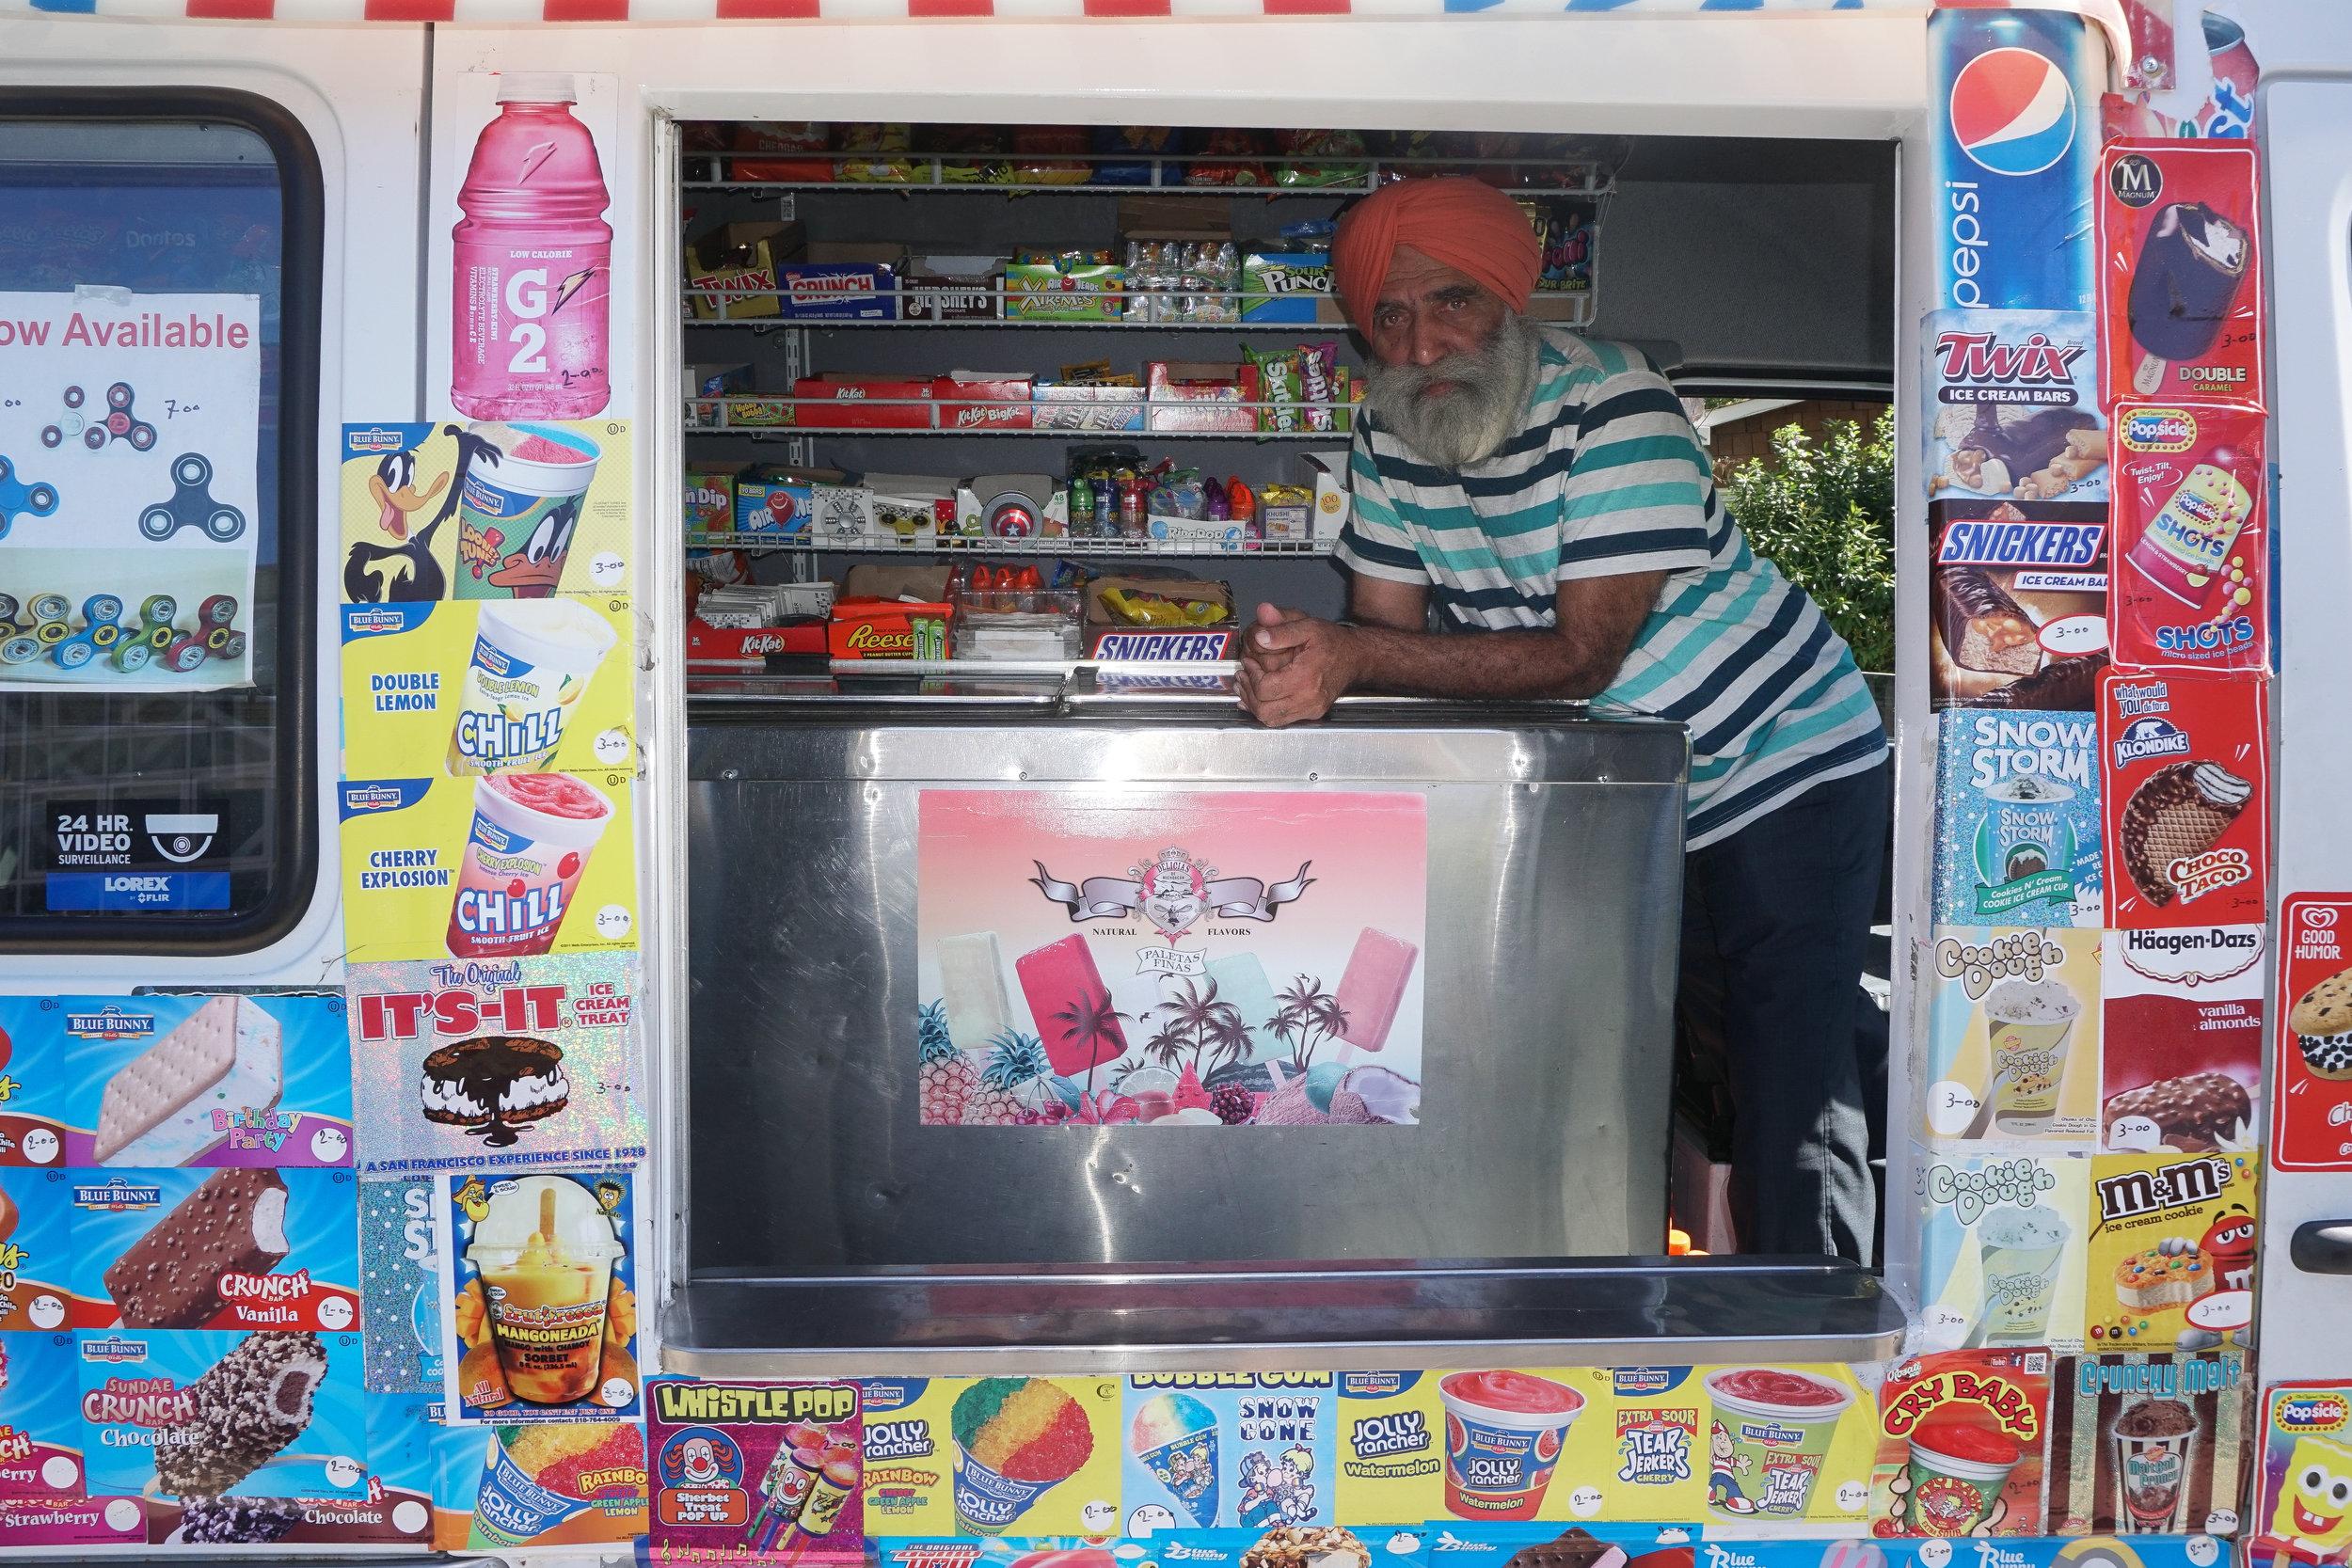 51-ice-cream-1-05875.jpg